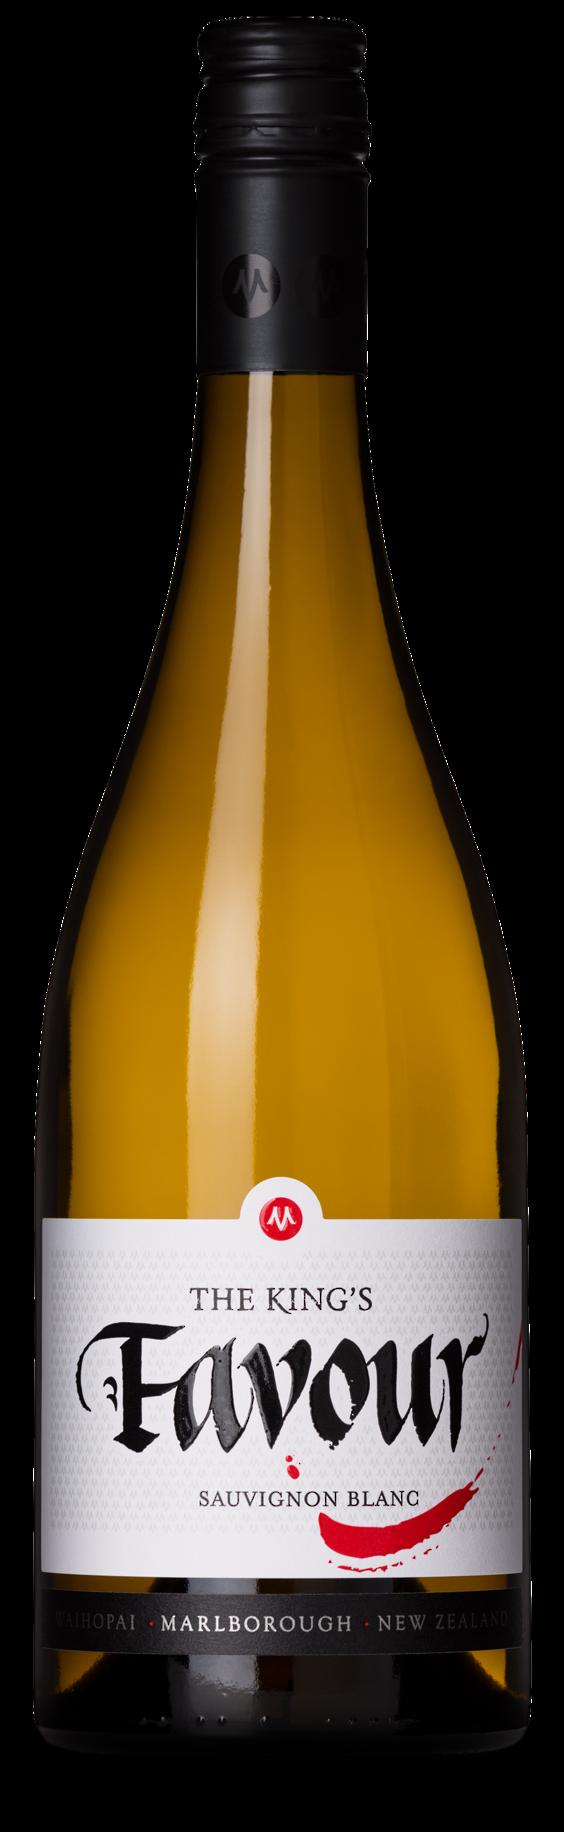 The King's Favour Sauvignon Blanc 2019 image 0